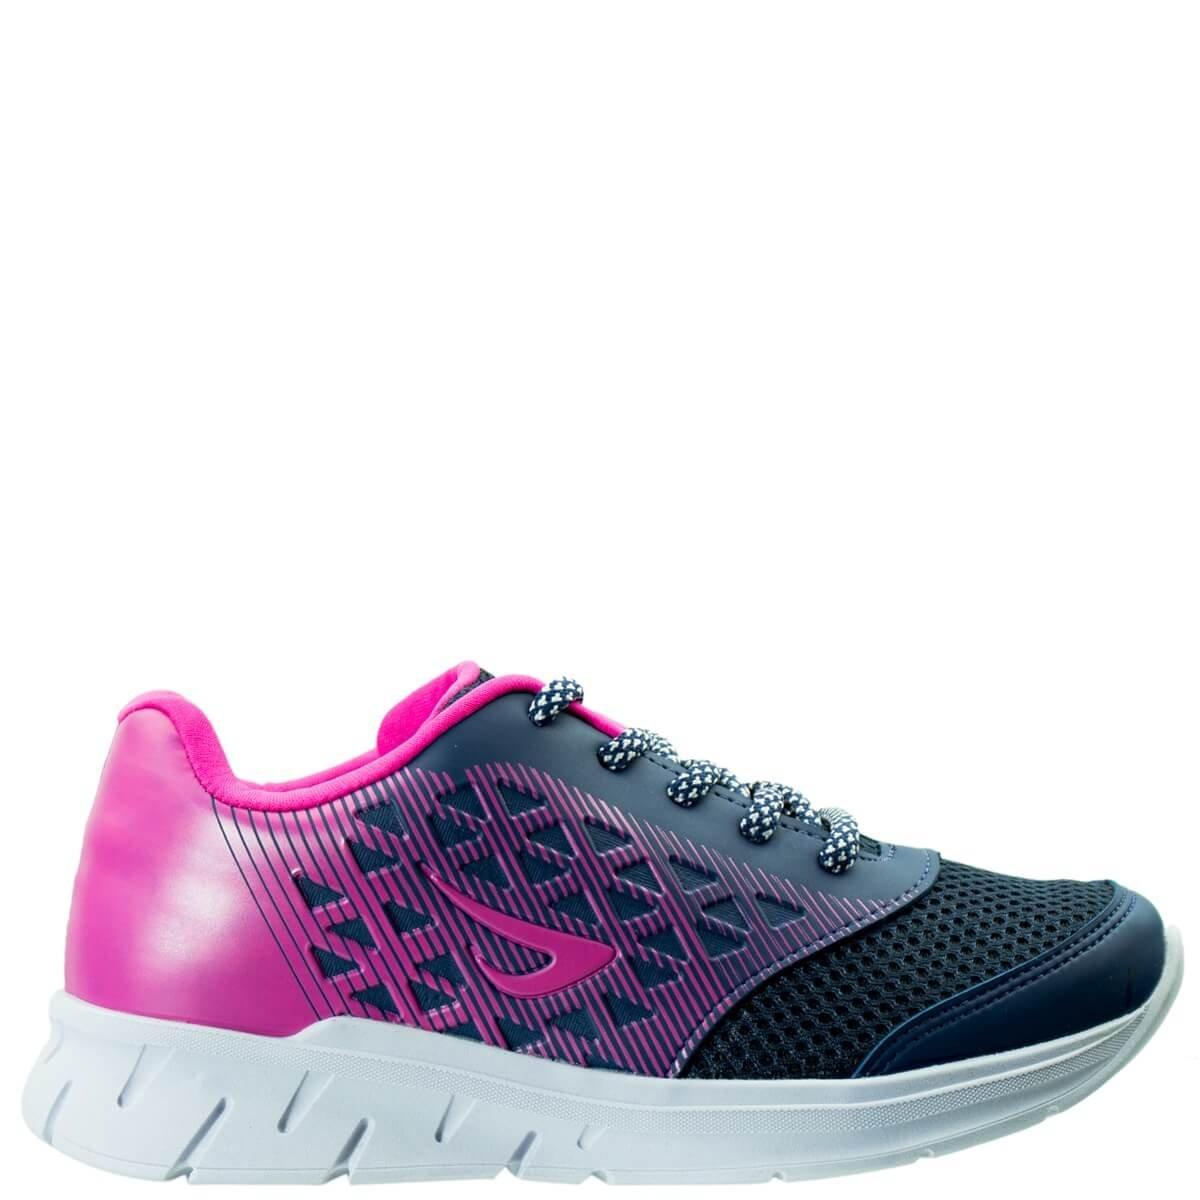 3f5e586d39 Bizz Store - Tênis Infantil Menina Ortopé Jogging Sport Marinho